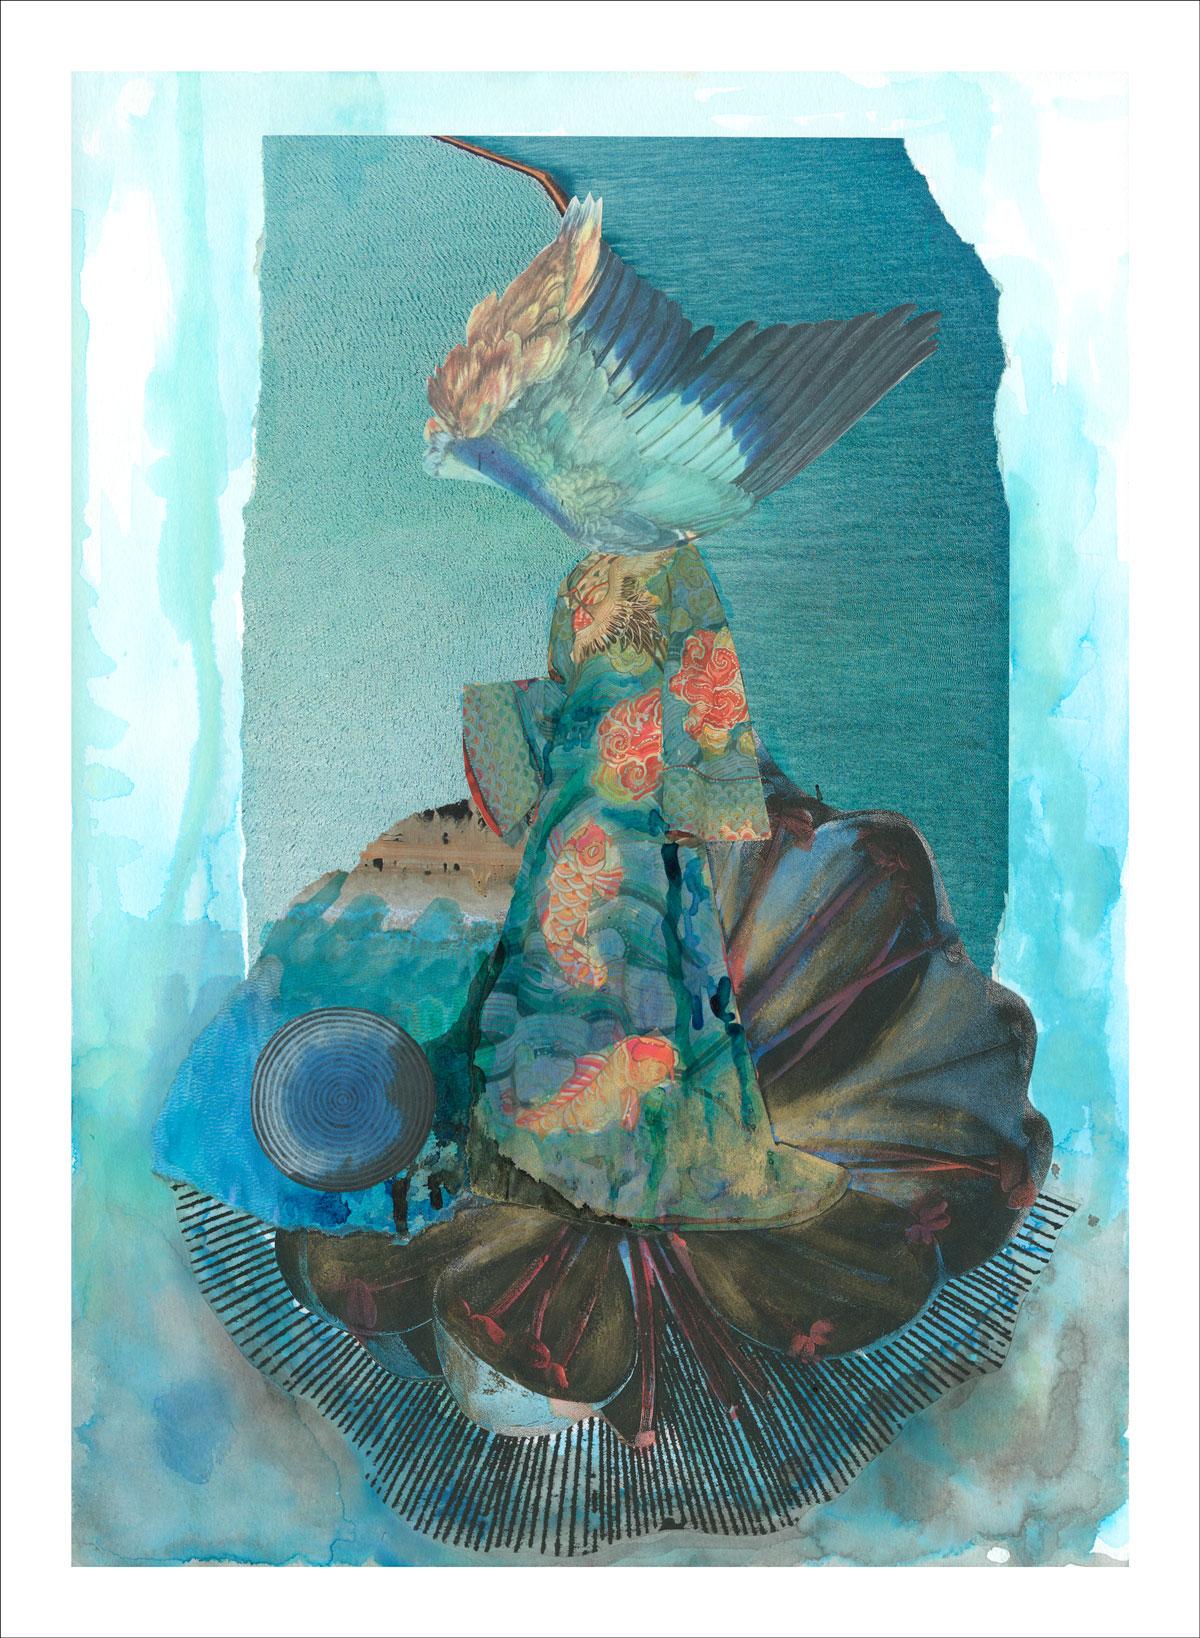 My Broken Wing of Desire - mixed media collage